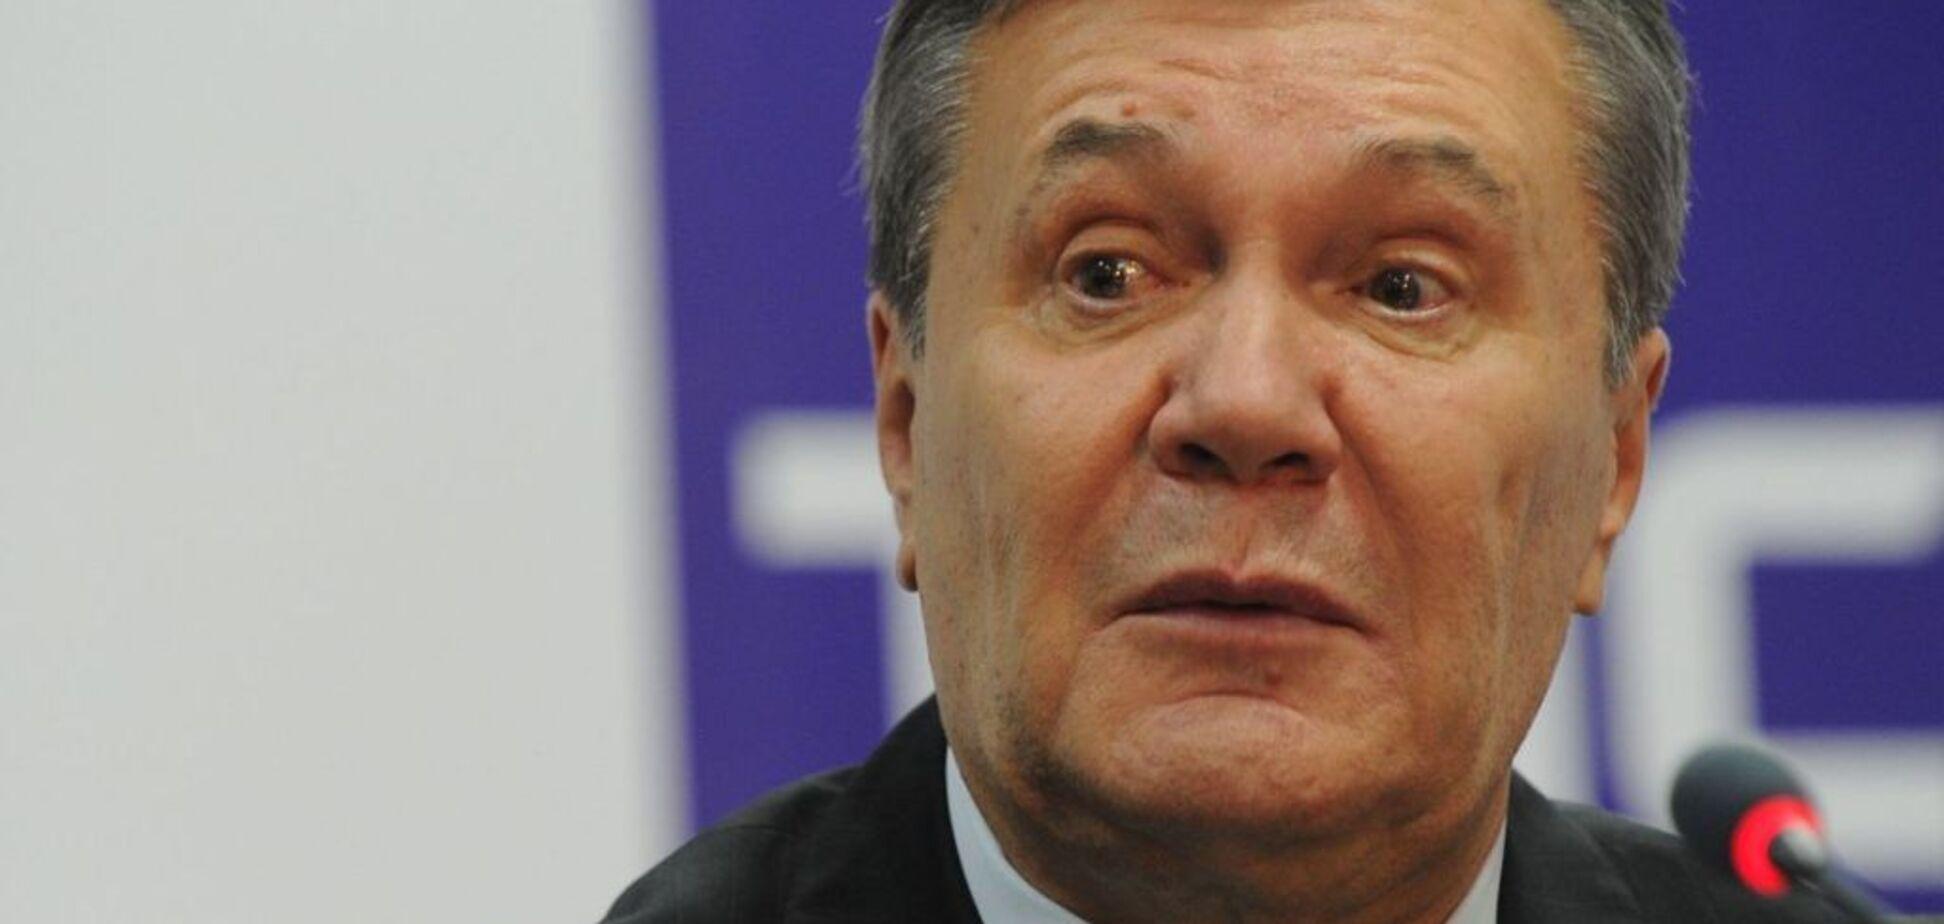 Янукович мог возглавить ''Л/ДНР'': всплыли детали